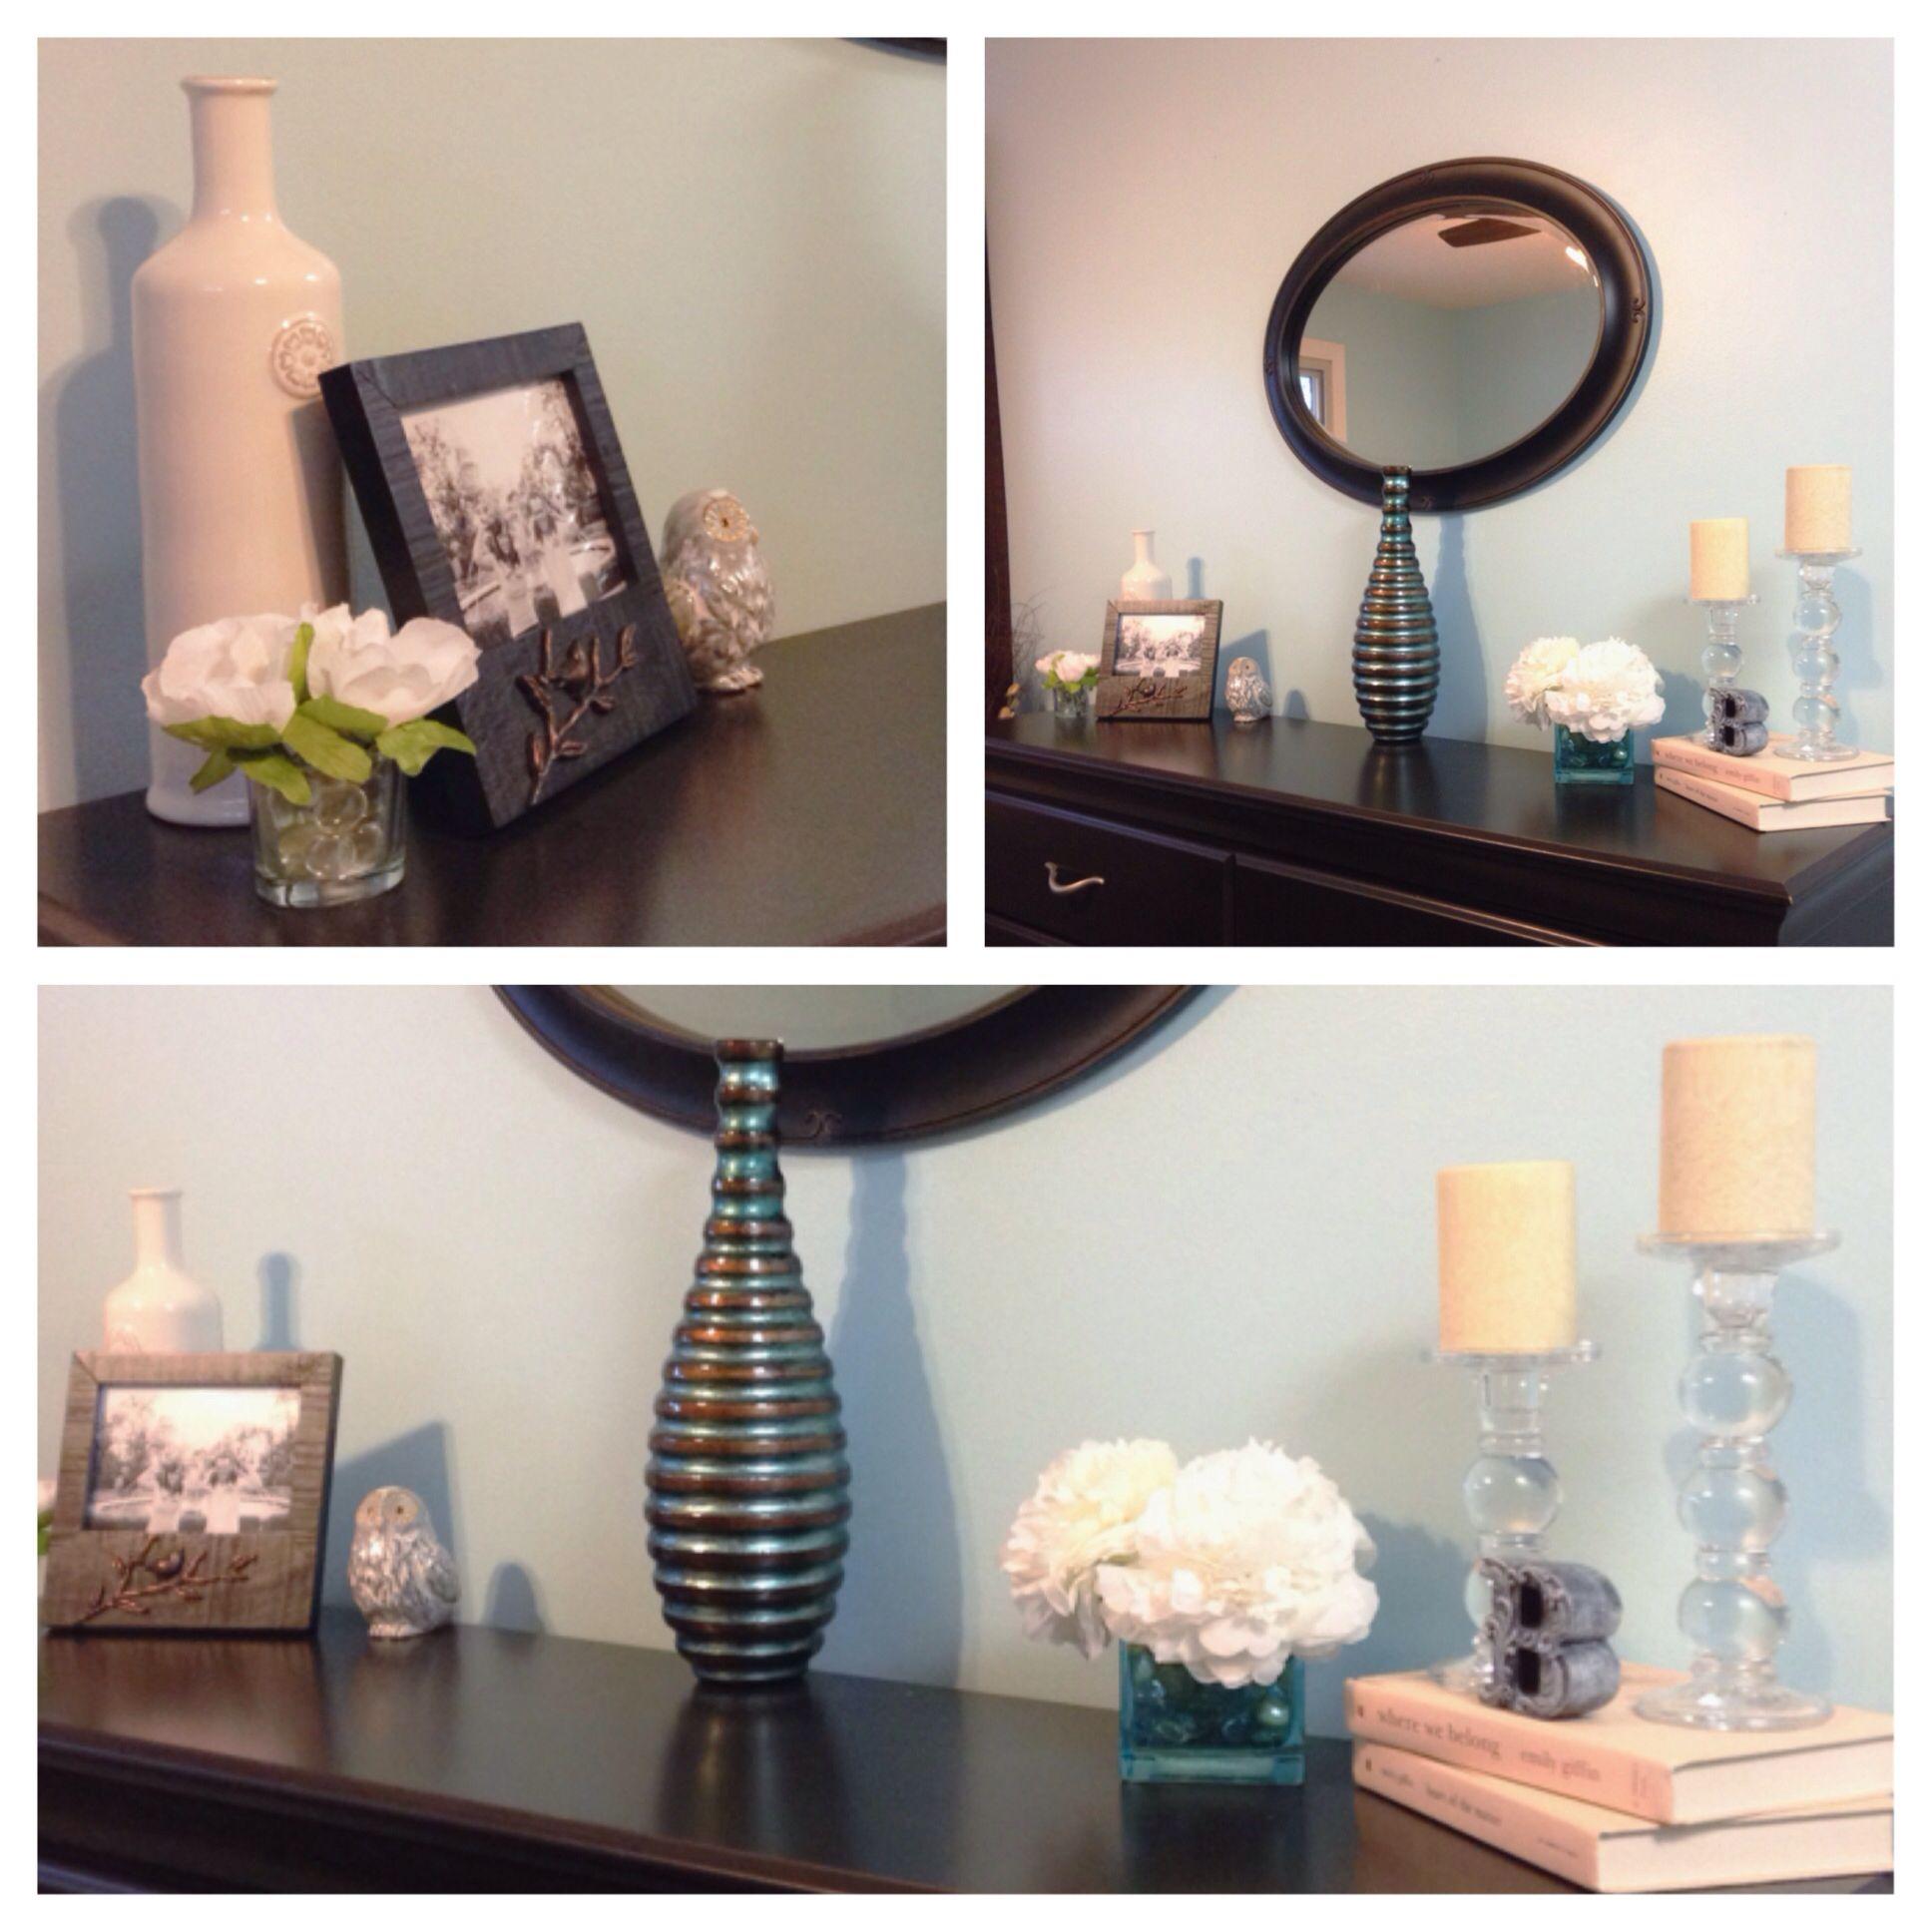 Dresser Decorating Ideas Glass Flowers Porcelain A Splash Of Color Dresser Decor Dresser Decor Bedroom Decor